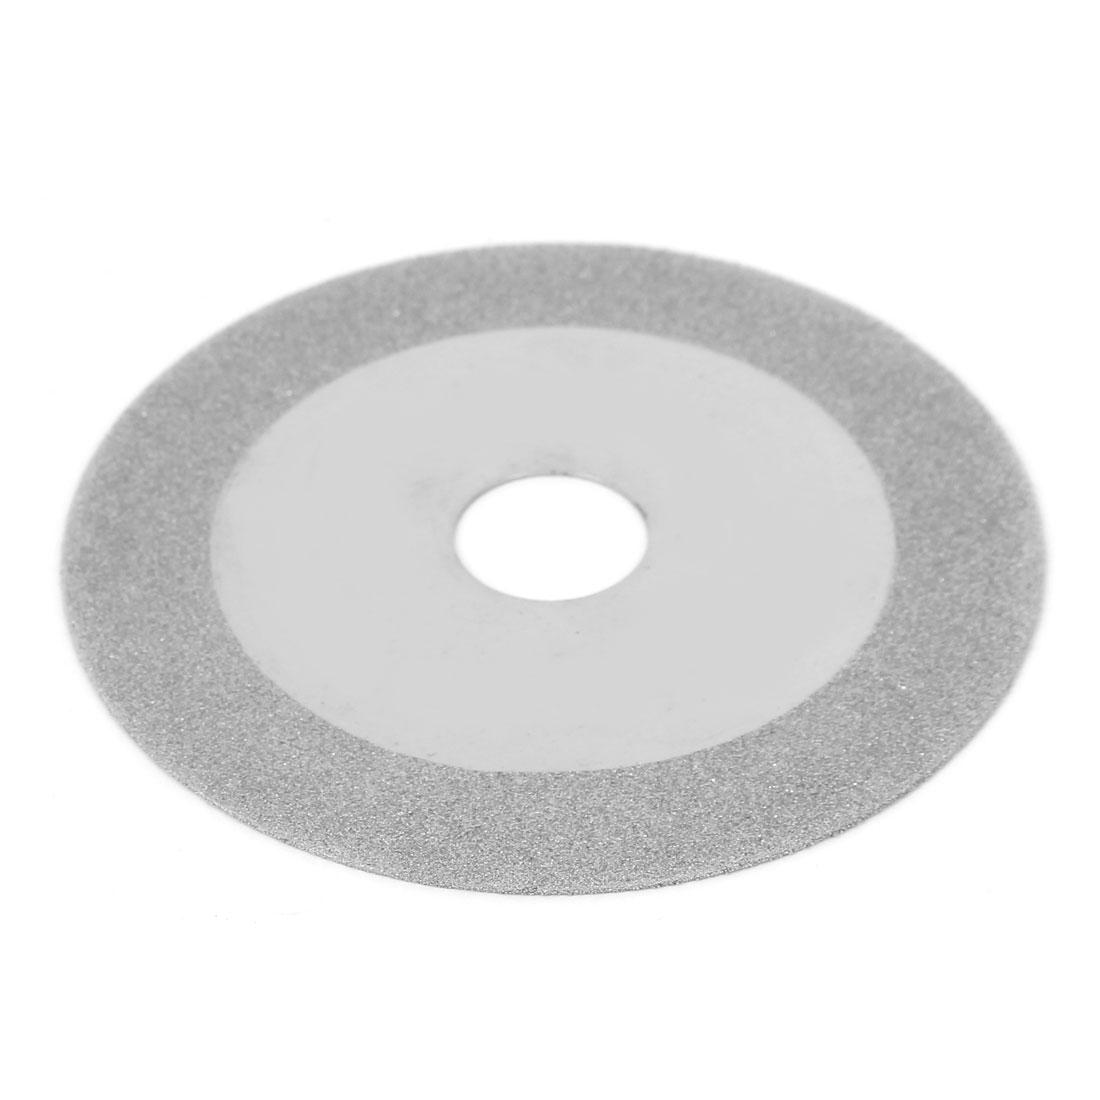 "4"" Dia Diamond Rotary Cutting Wheel Cut Off Cutter Grinding Disc"